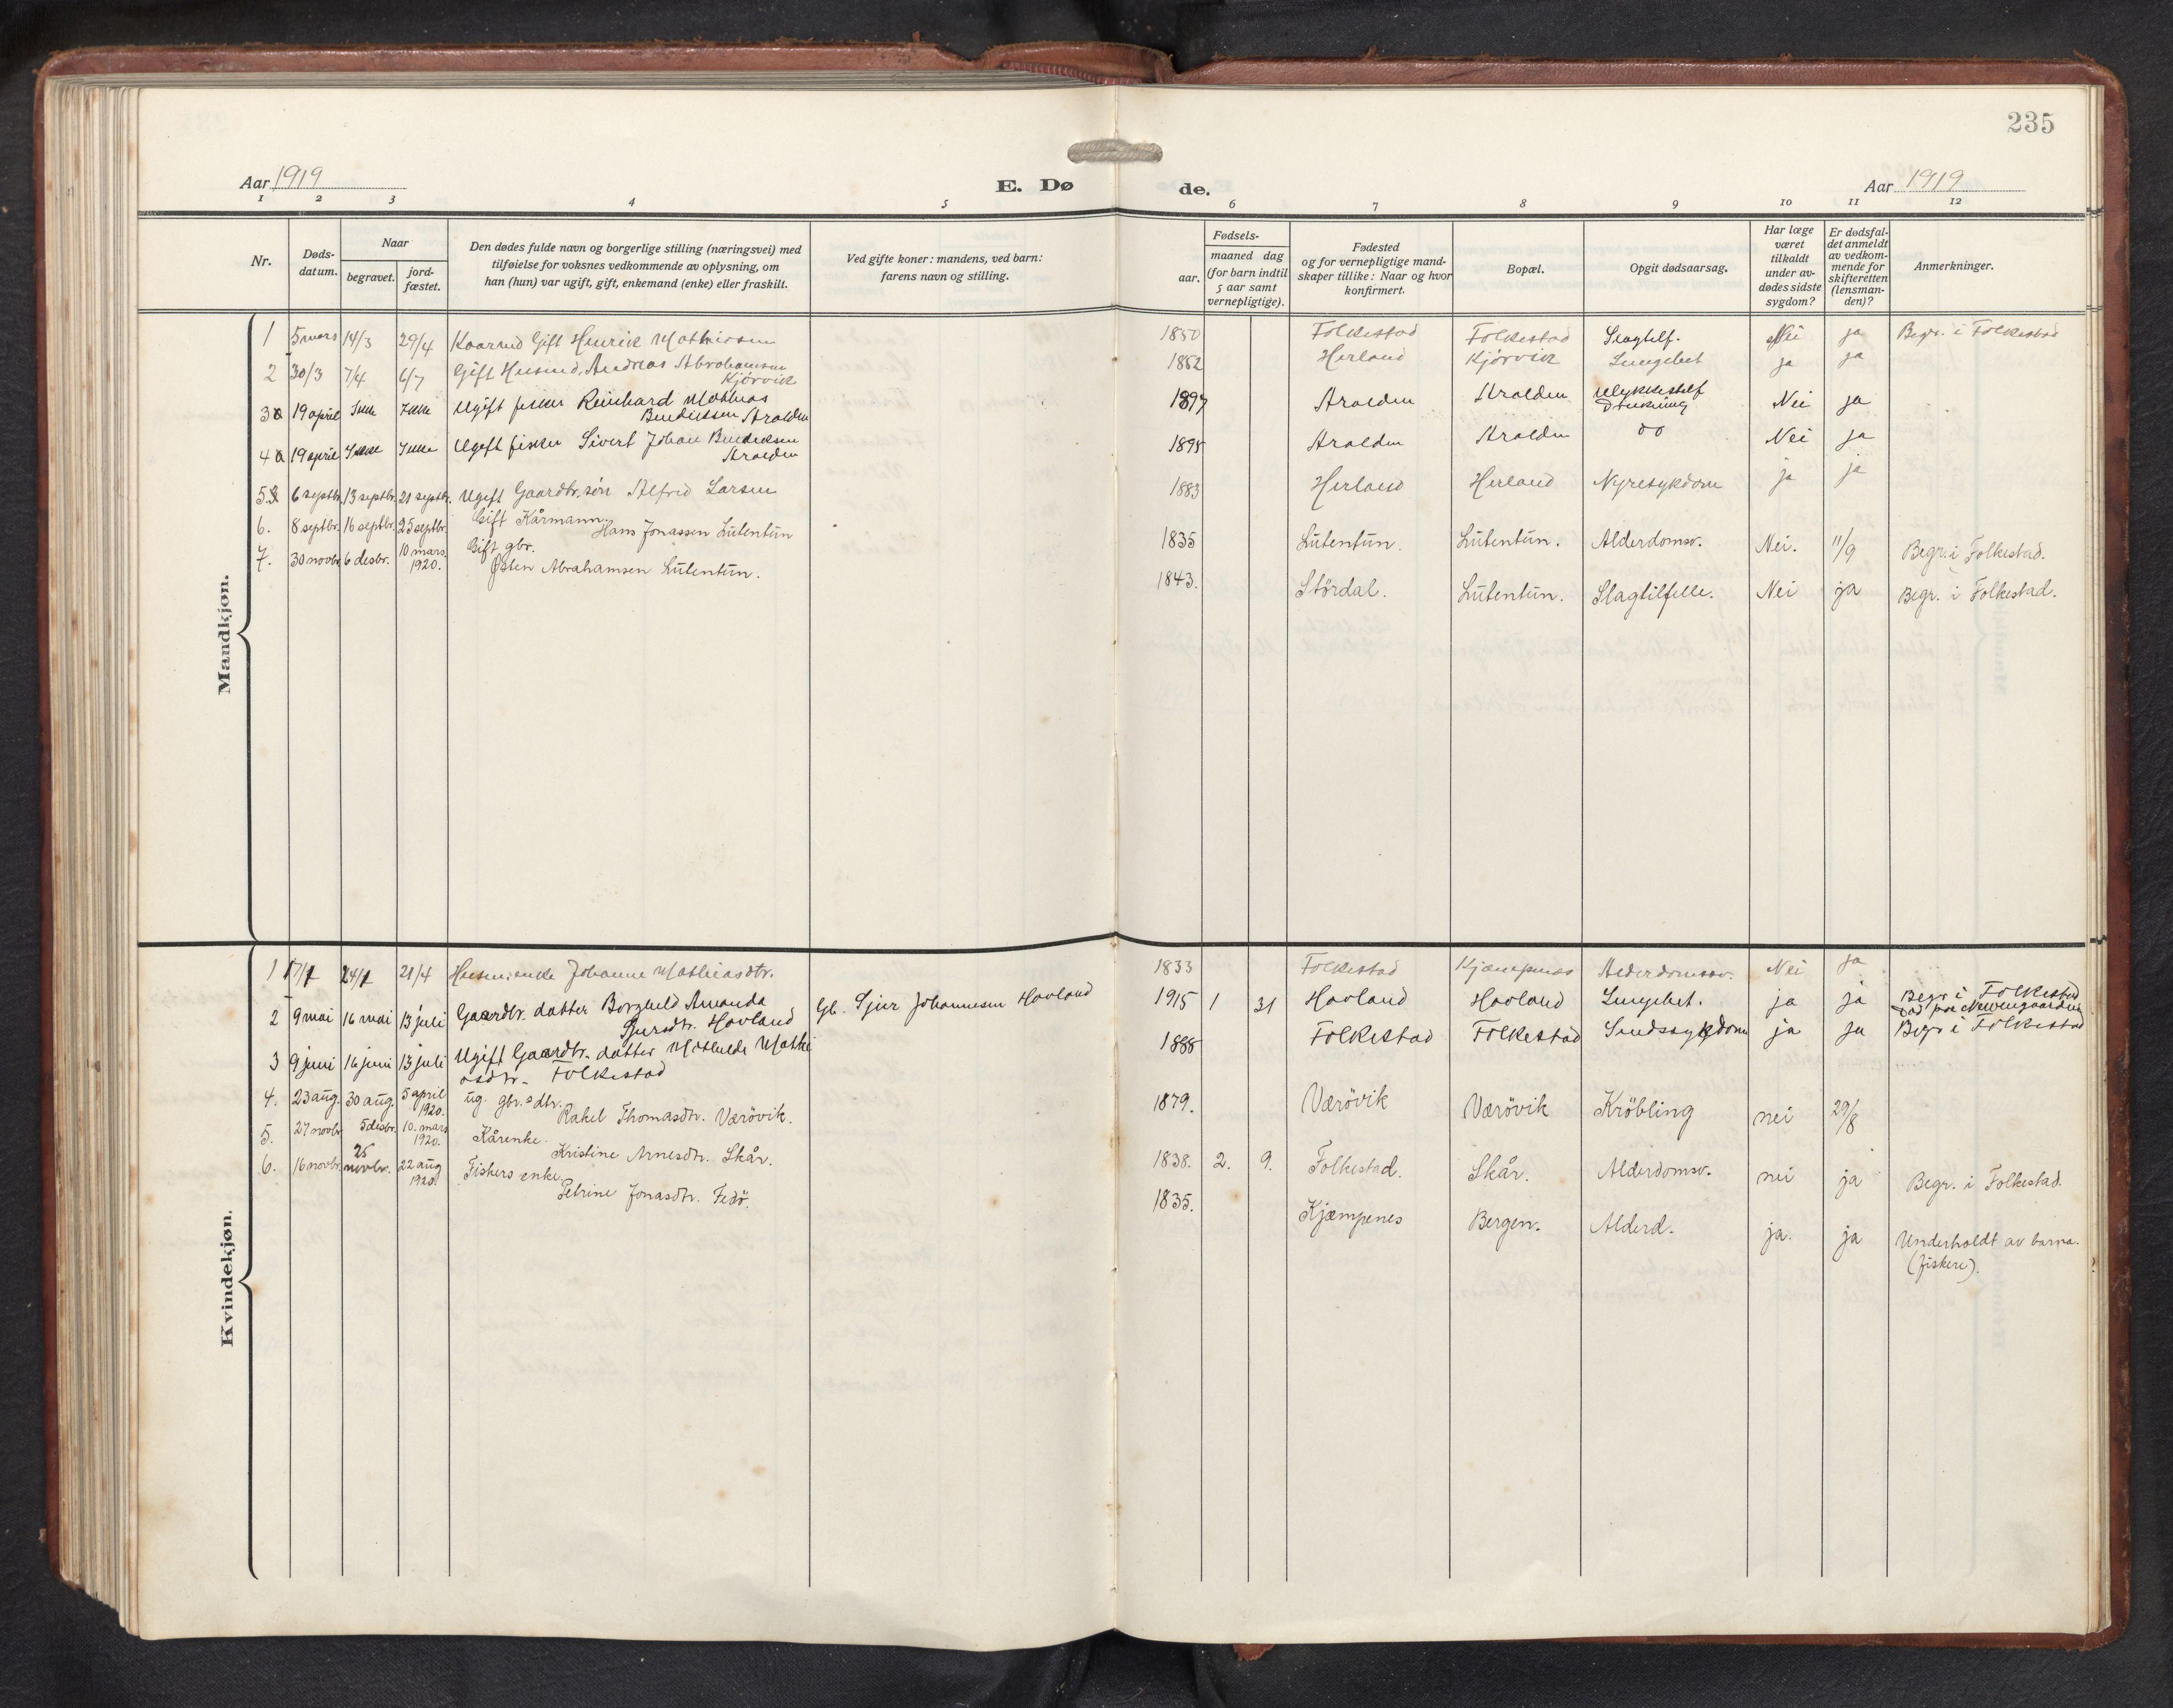 SAB, Askvoll sokneprestembete, H/Hab/Habb/L0002: Klokkerbok nr. B 2, 1910-1947, s. 234b-235a